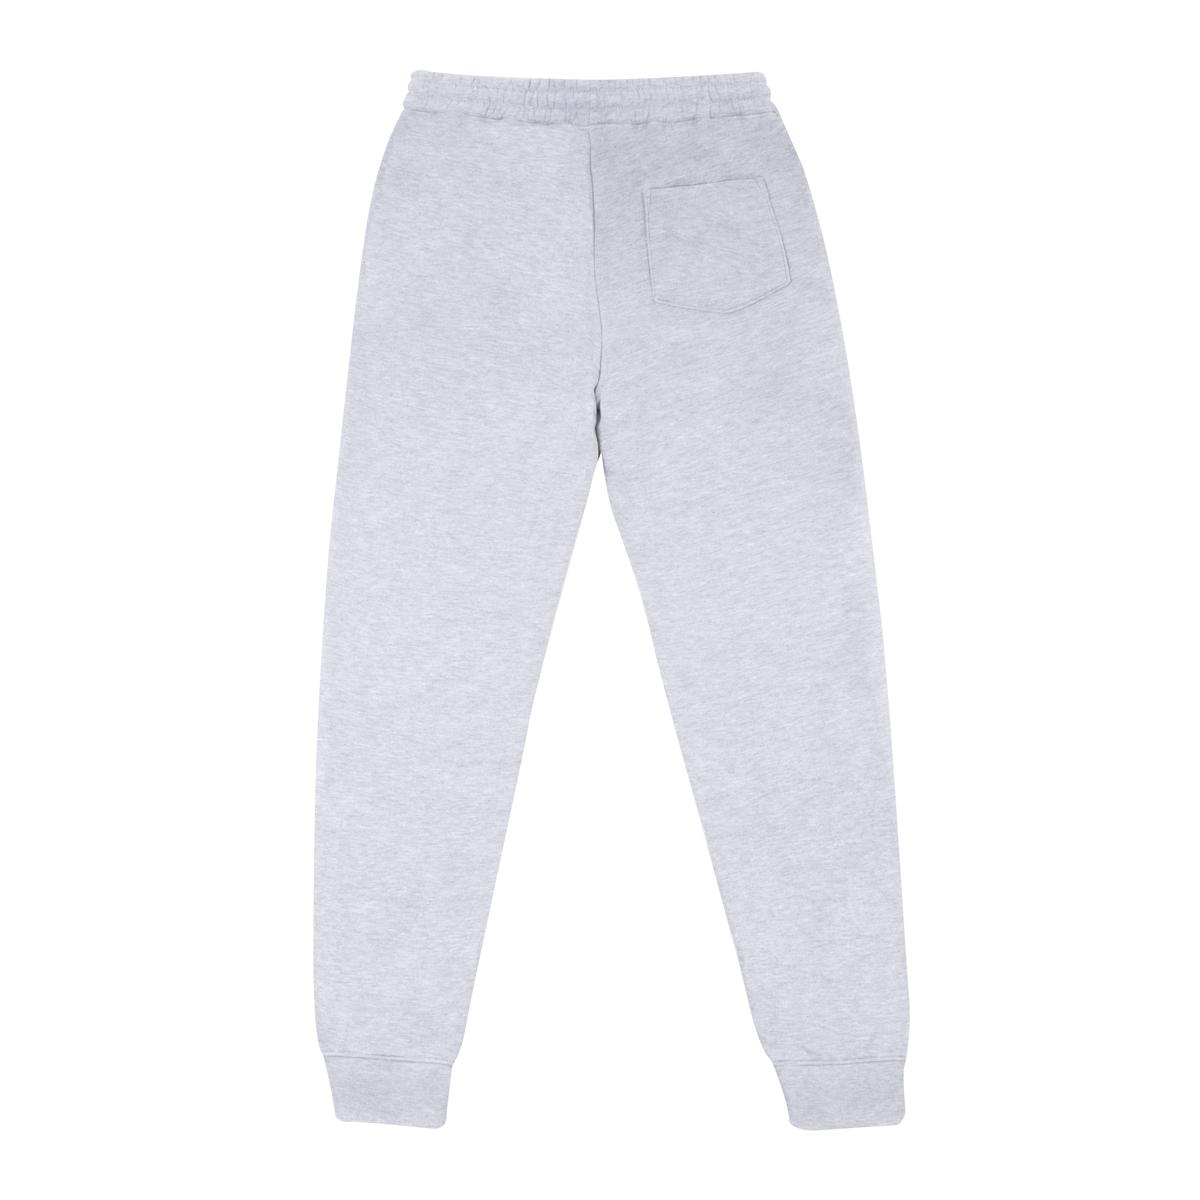 University Sweatpants (Heather Grey)